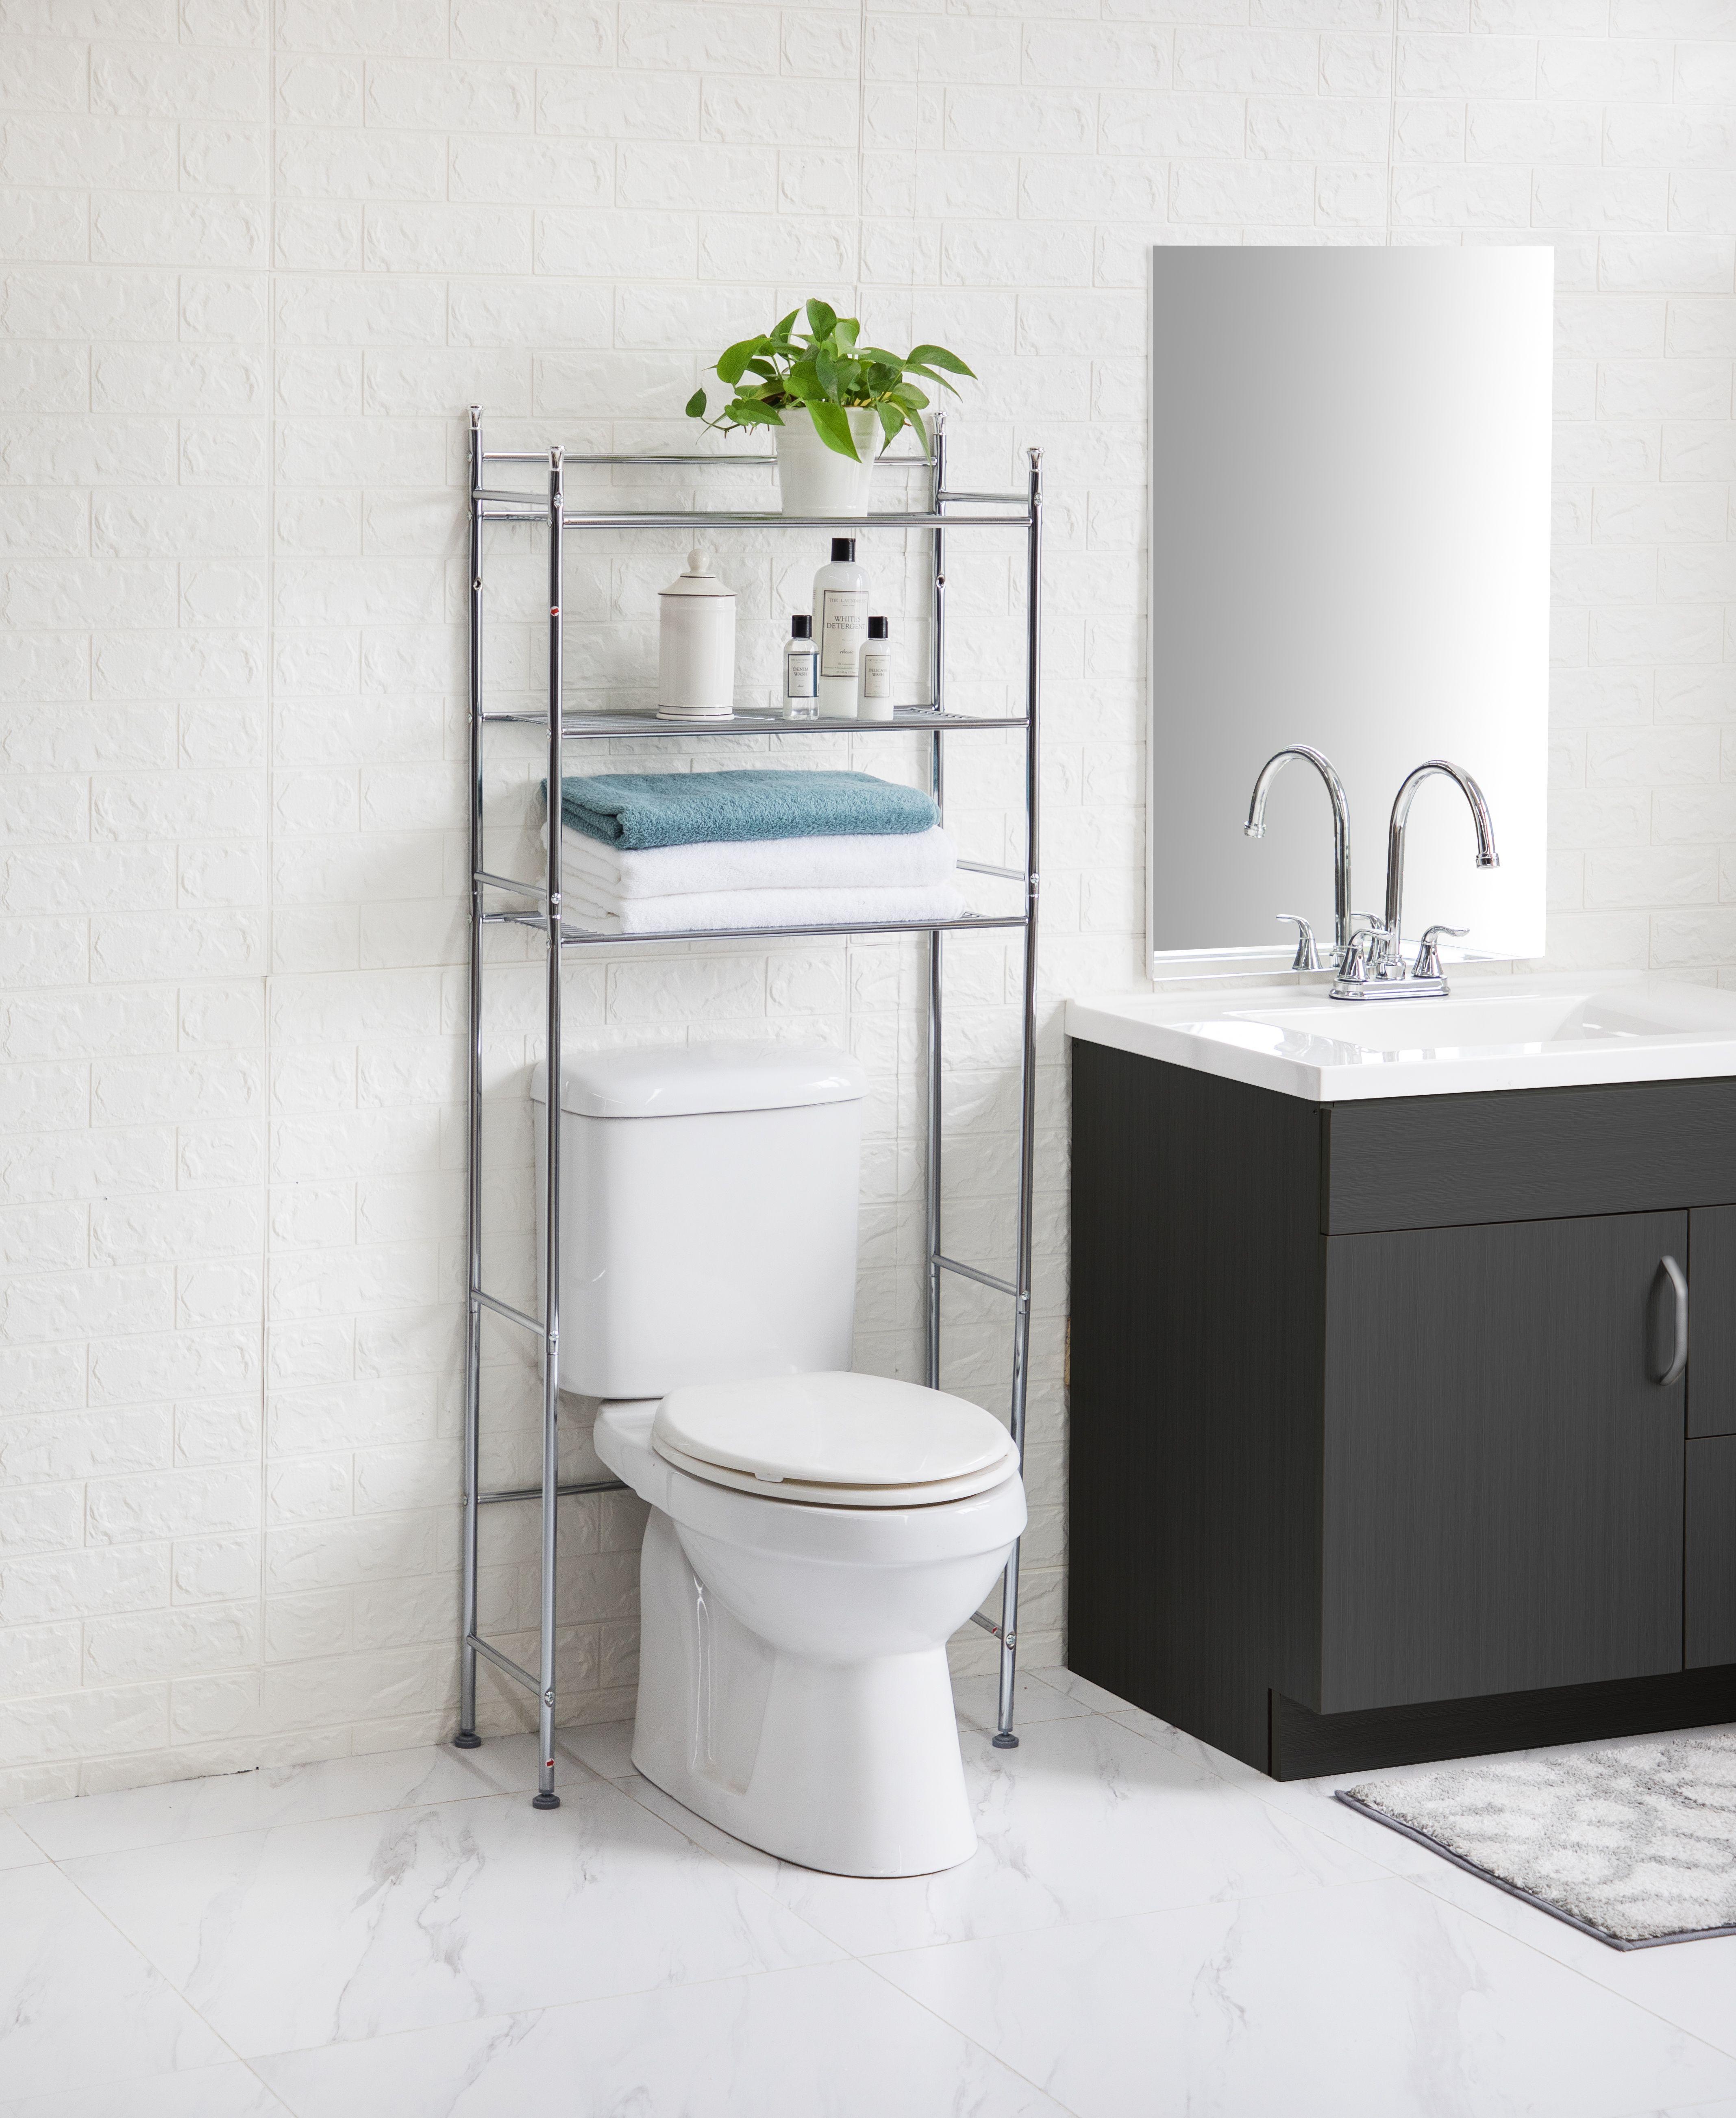 Home Shelves Toilet Bathroom Storage